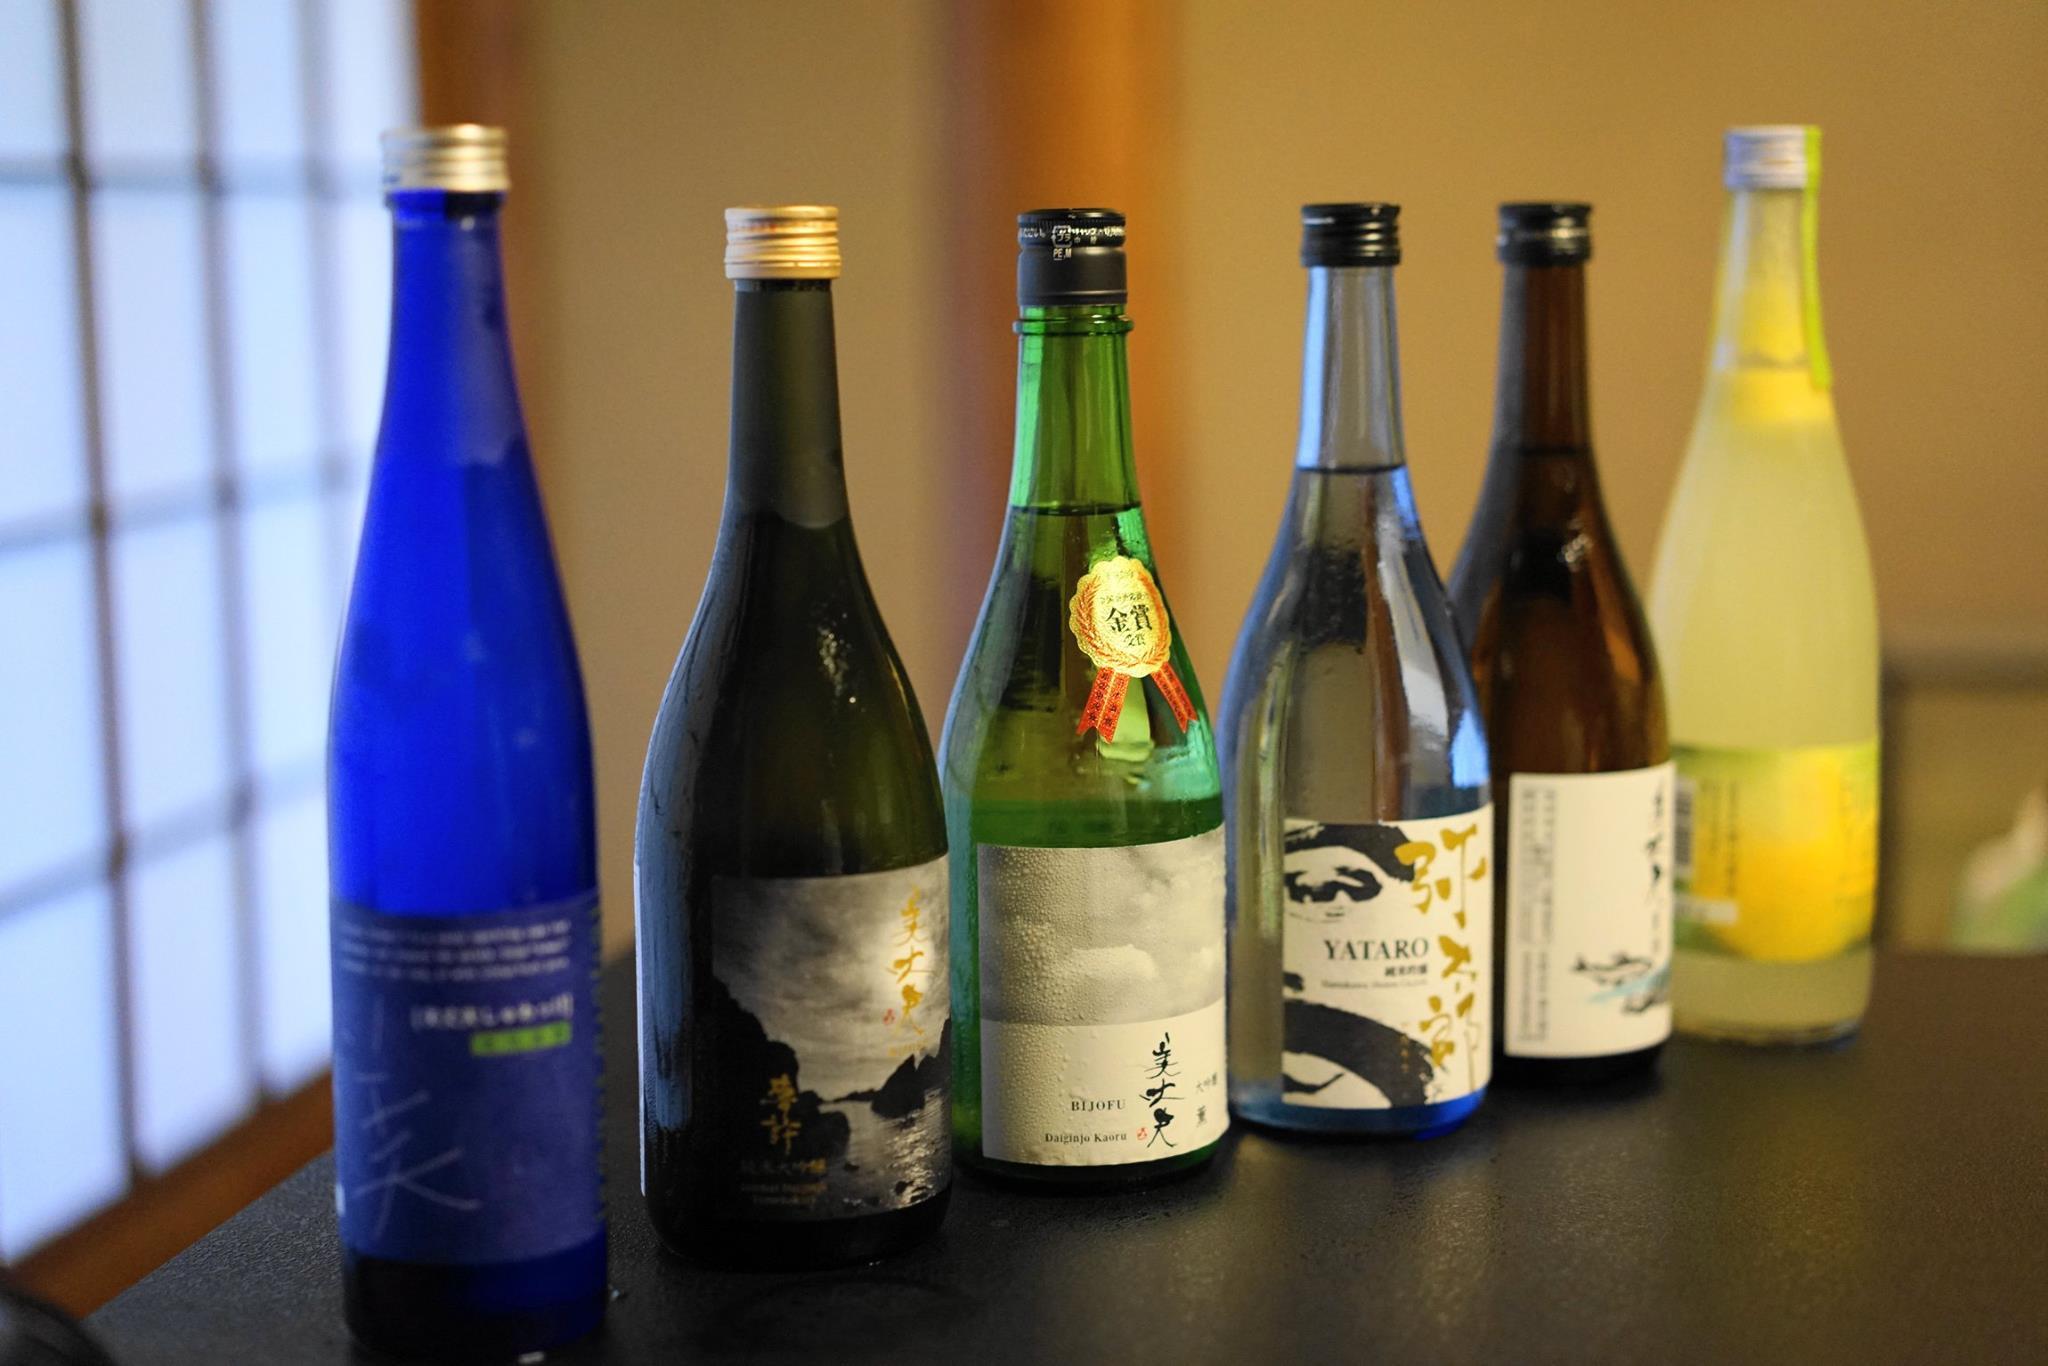 Perfect pairings: fine artisanal cheese and rare Japanese sake